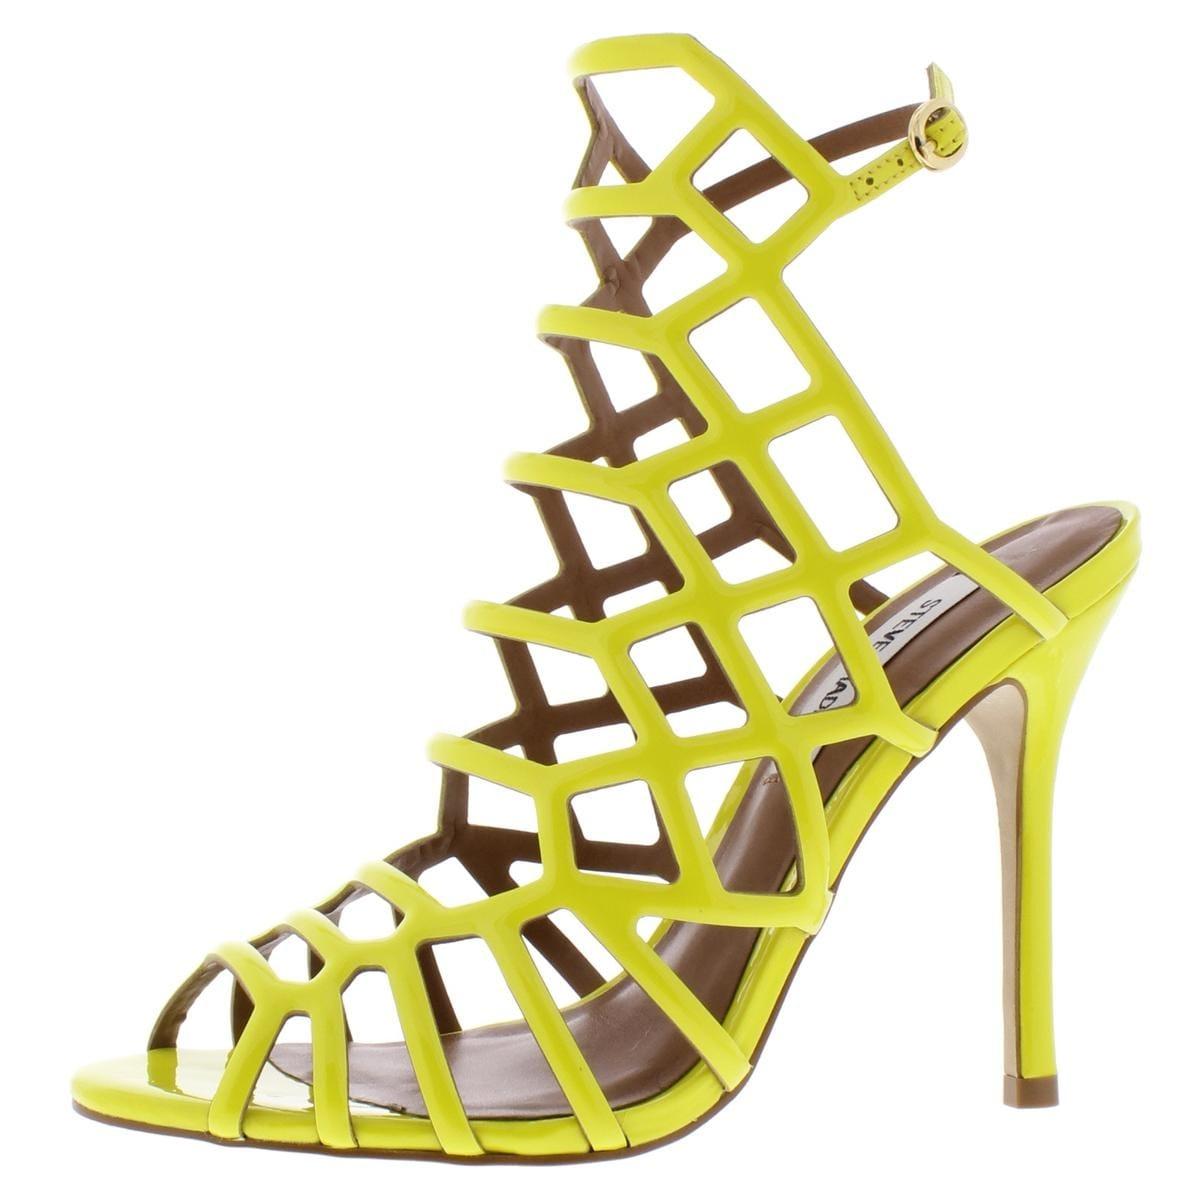 748afd3272b Steve Madden Womens Slithur Dress Sandals Caged